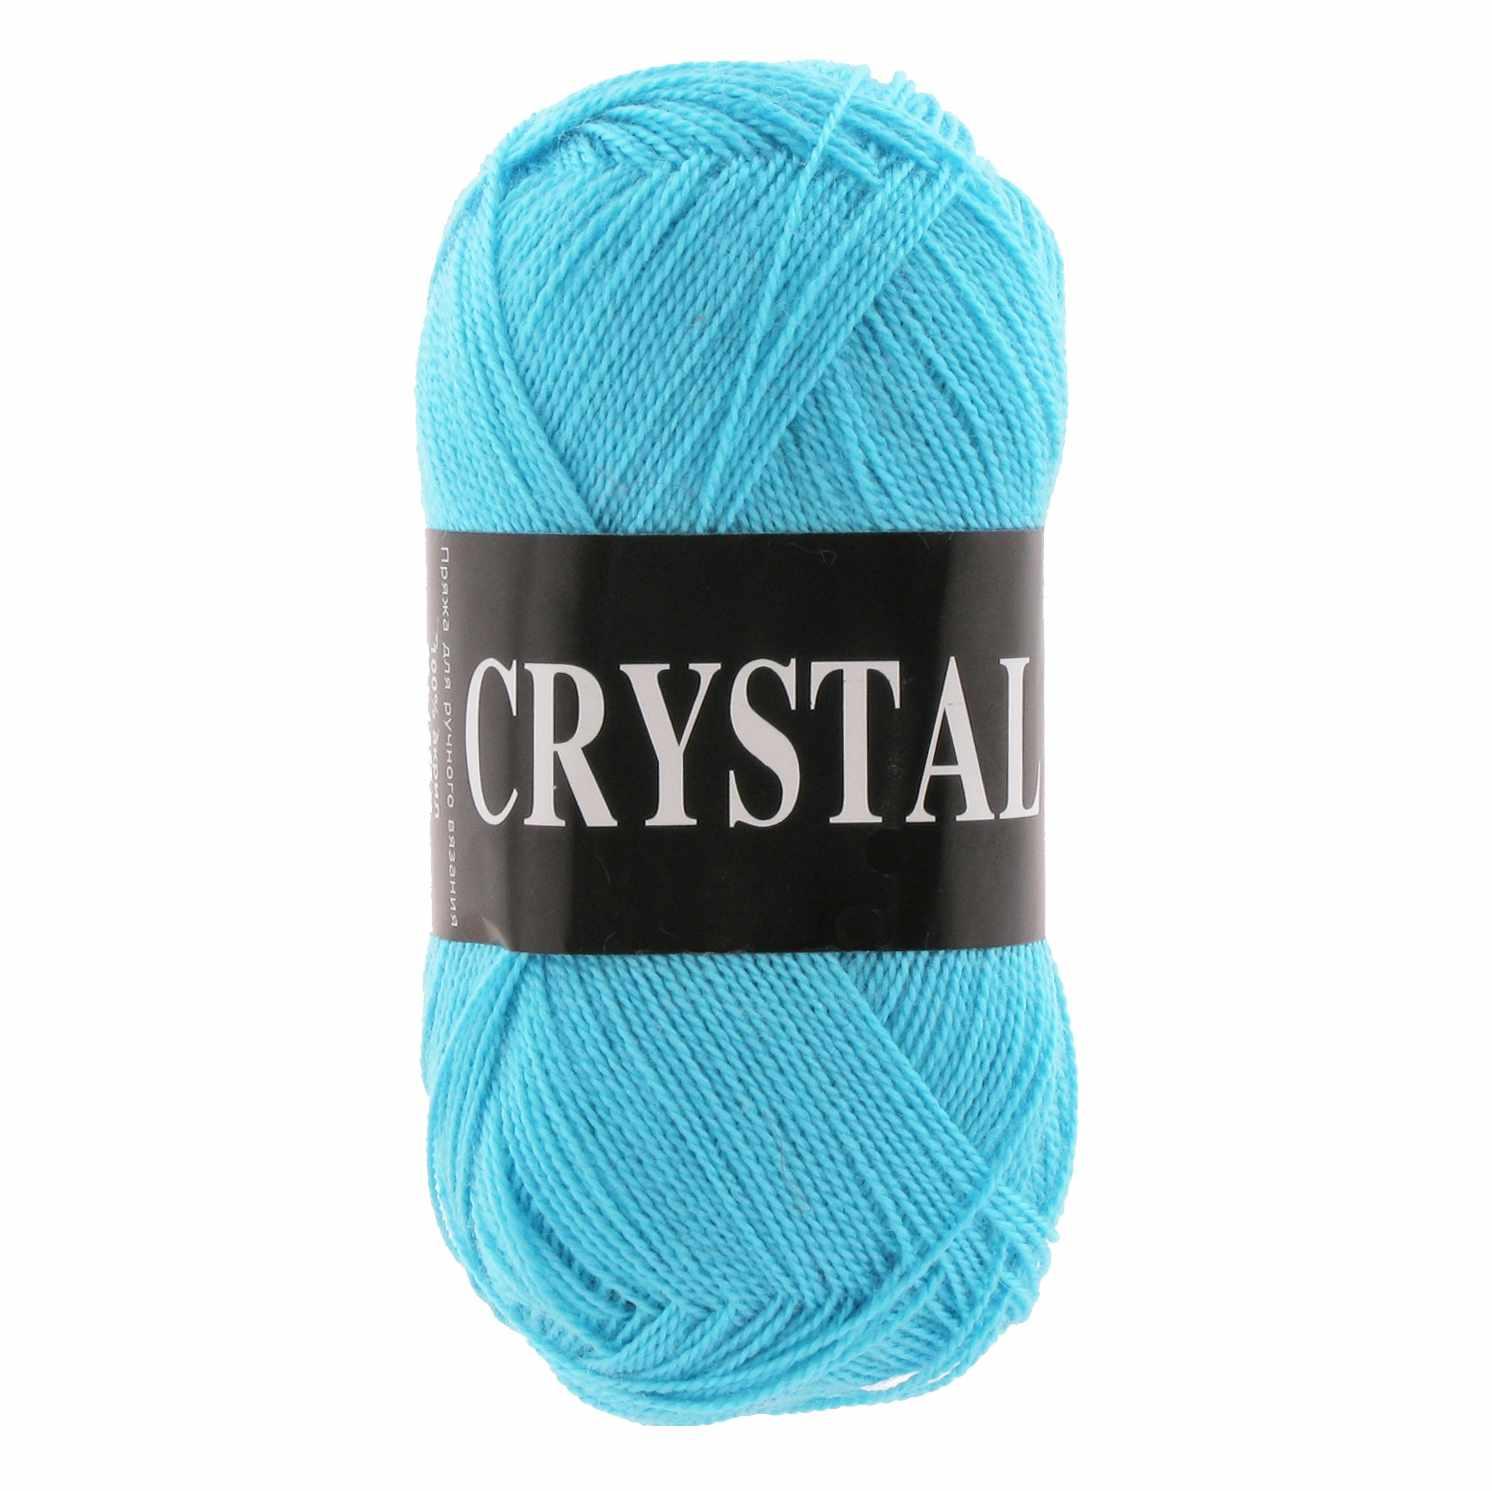 Пряжа VITA Crystal Цвет.5665 Светлая голубая бирюза